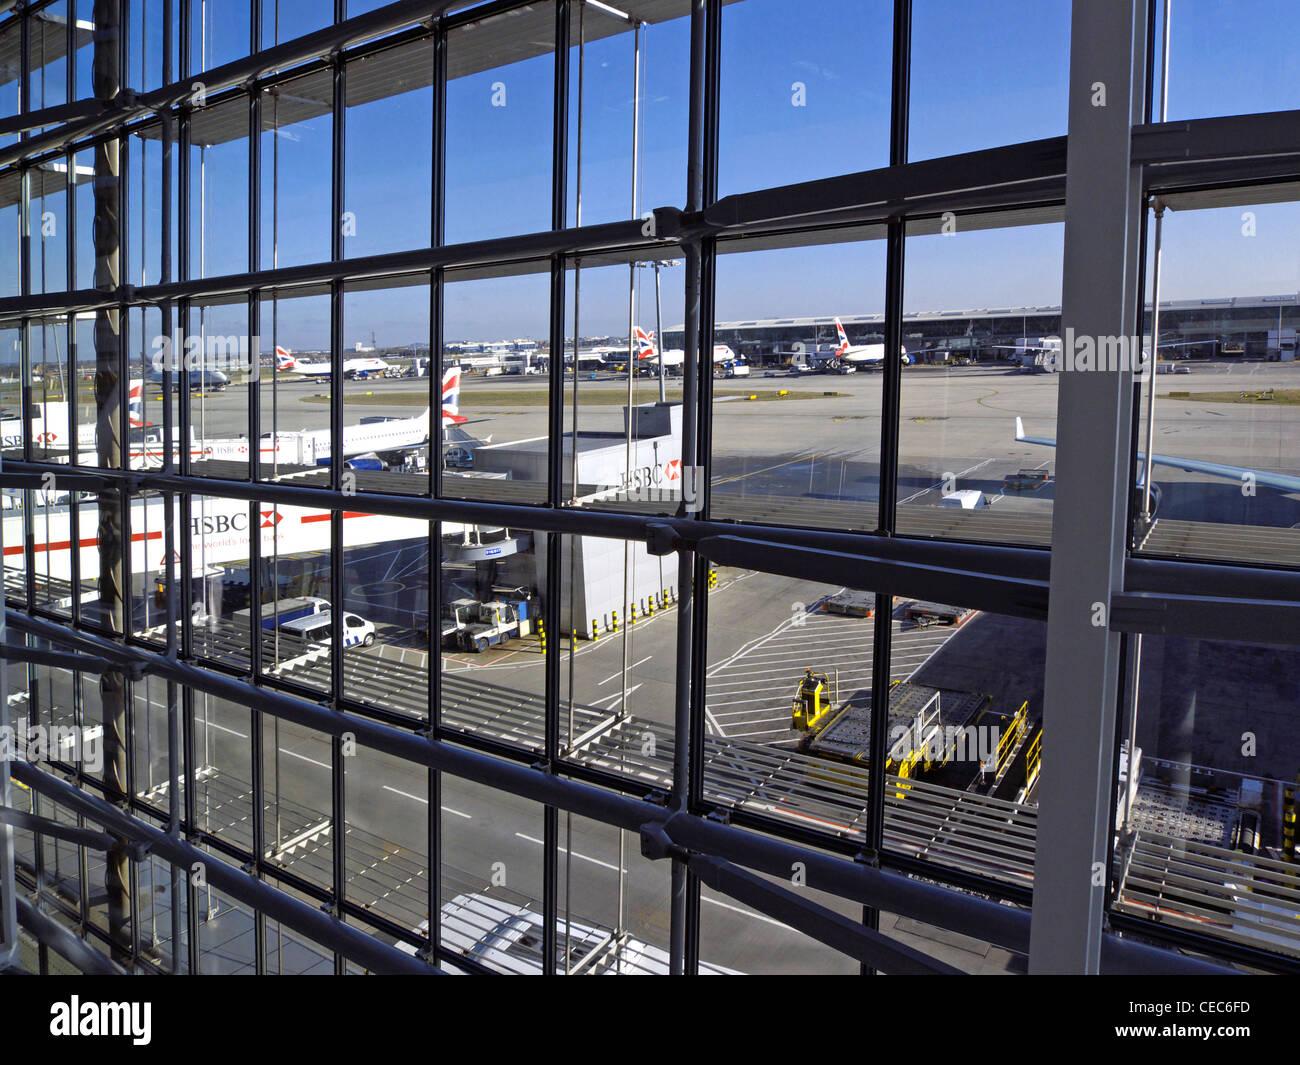 united kingdom west london heathrow airport terminal 5 - Stock Image